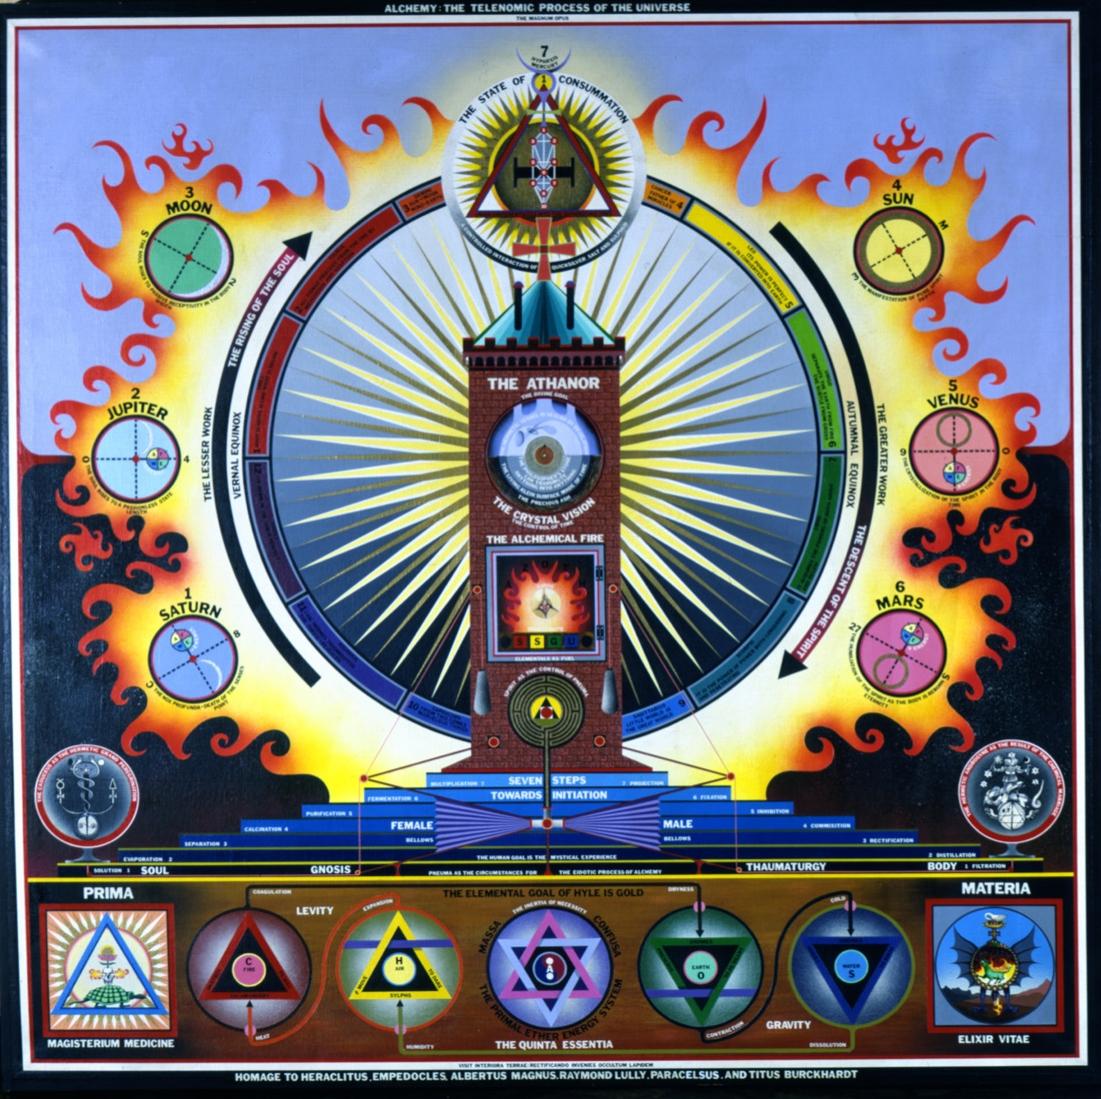 Alchemy: The Telenomic Process of the Universe (1973)